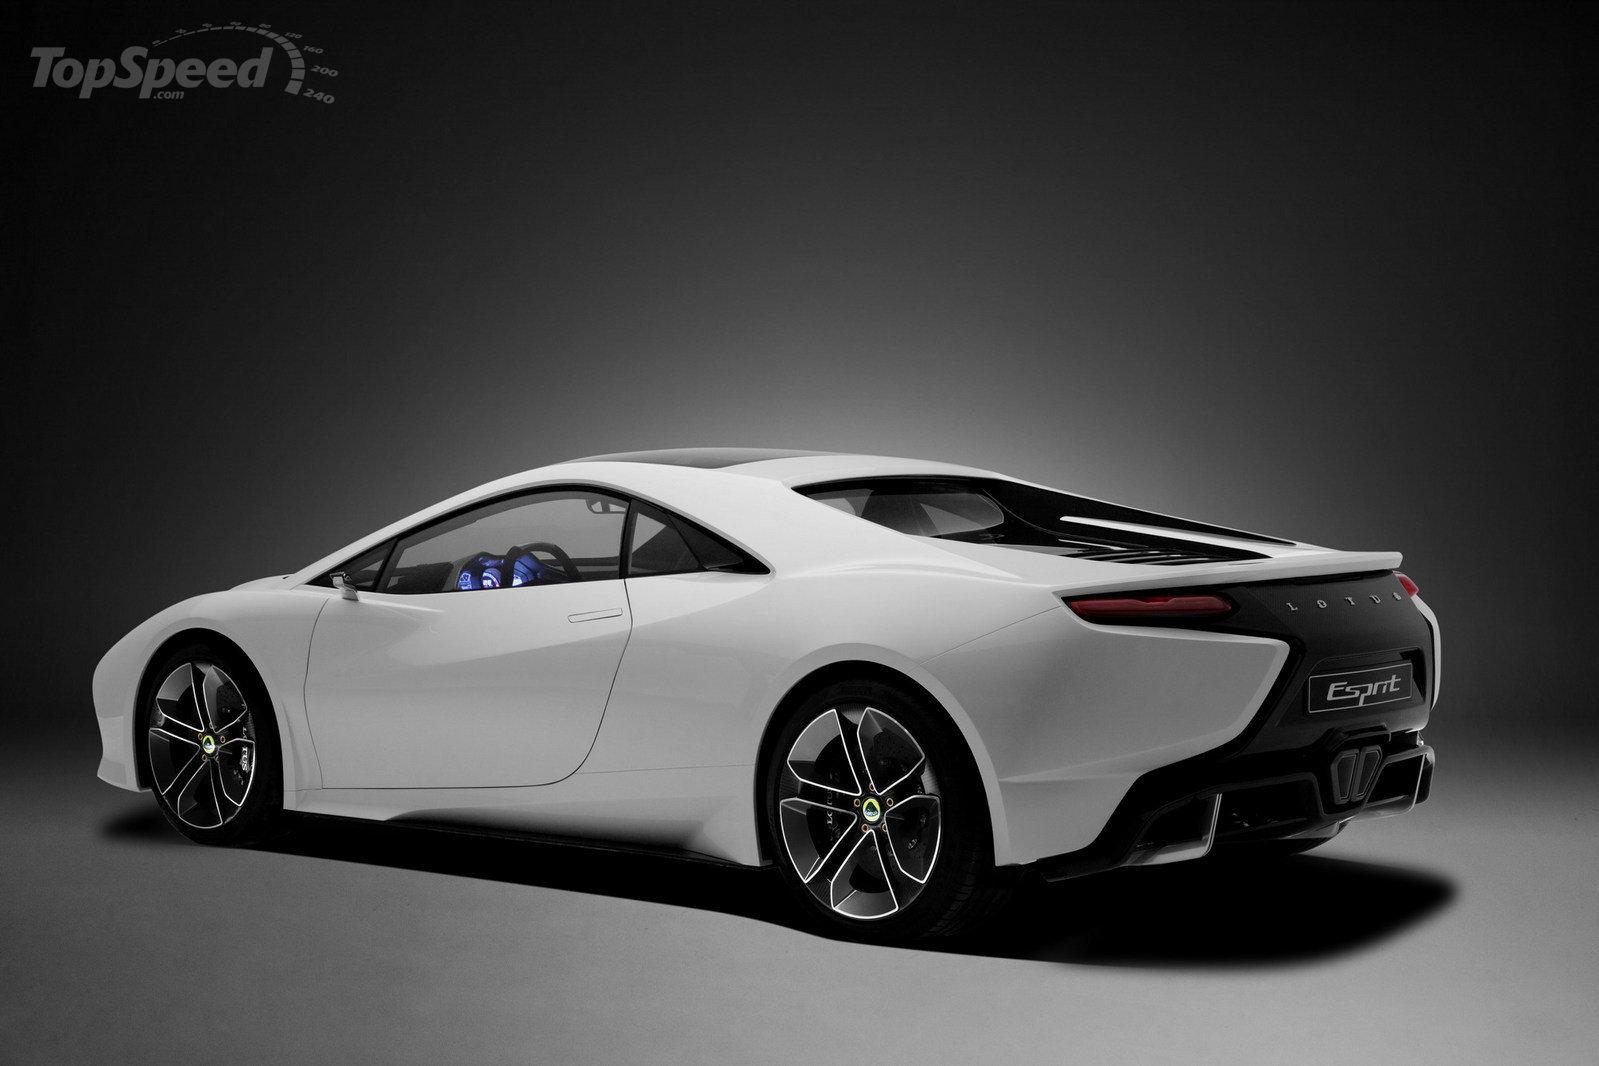 lotus esprit 74 widescreen car wallpaper